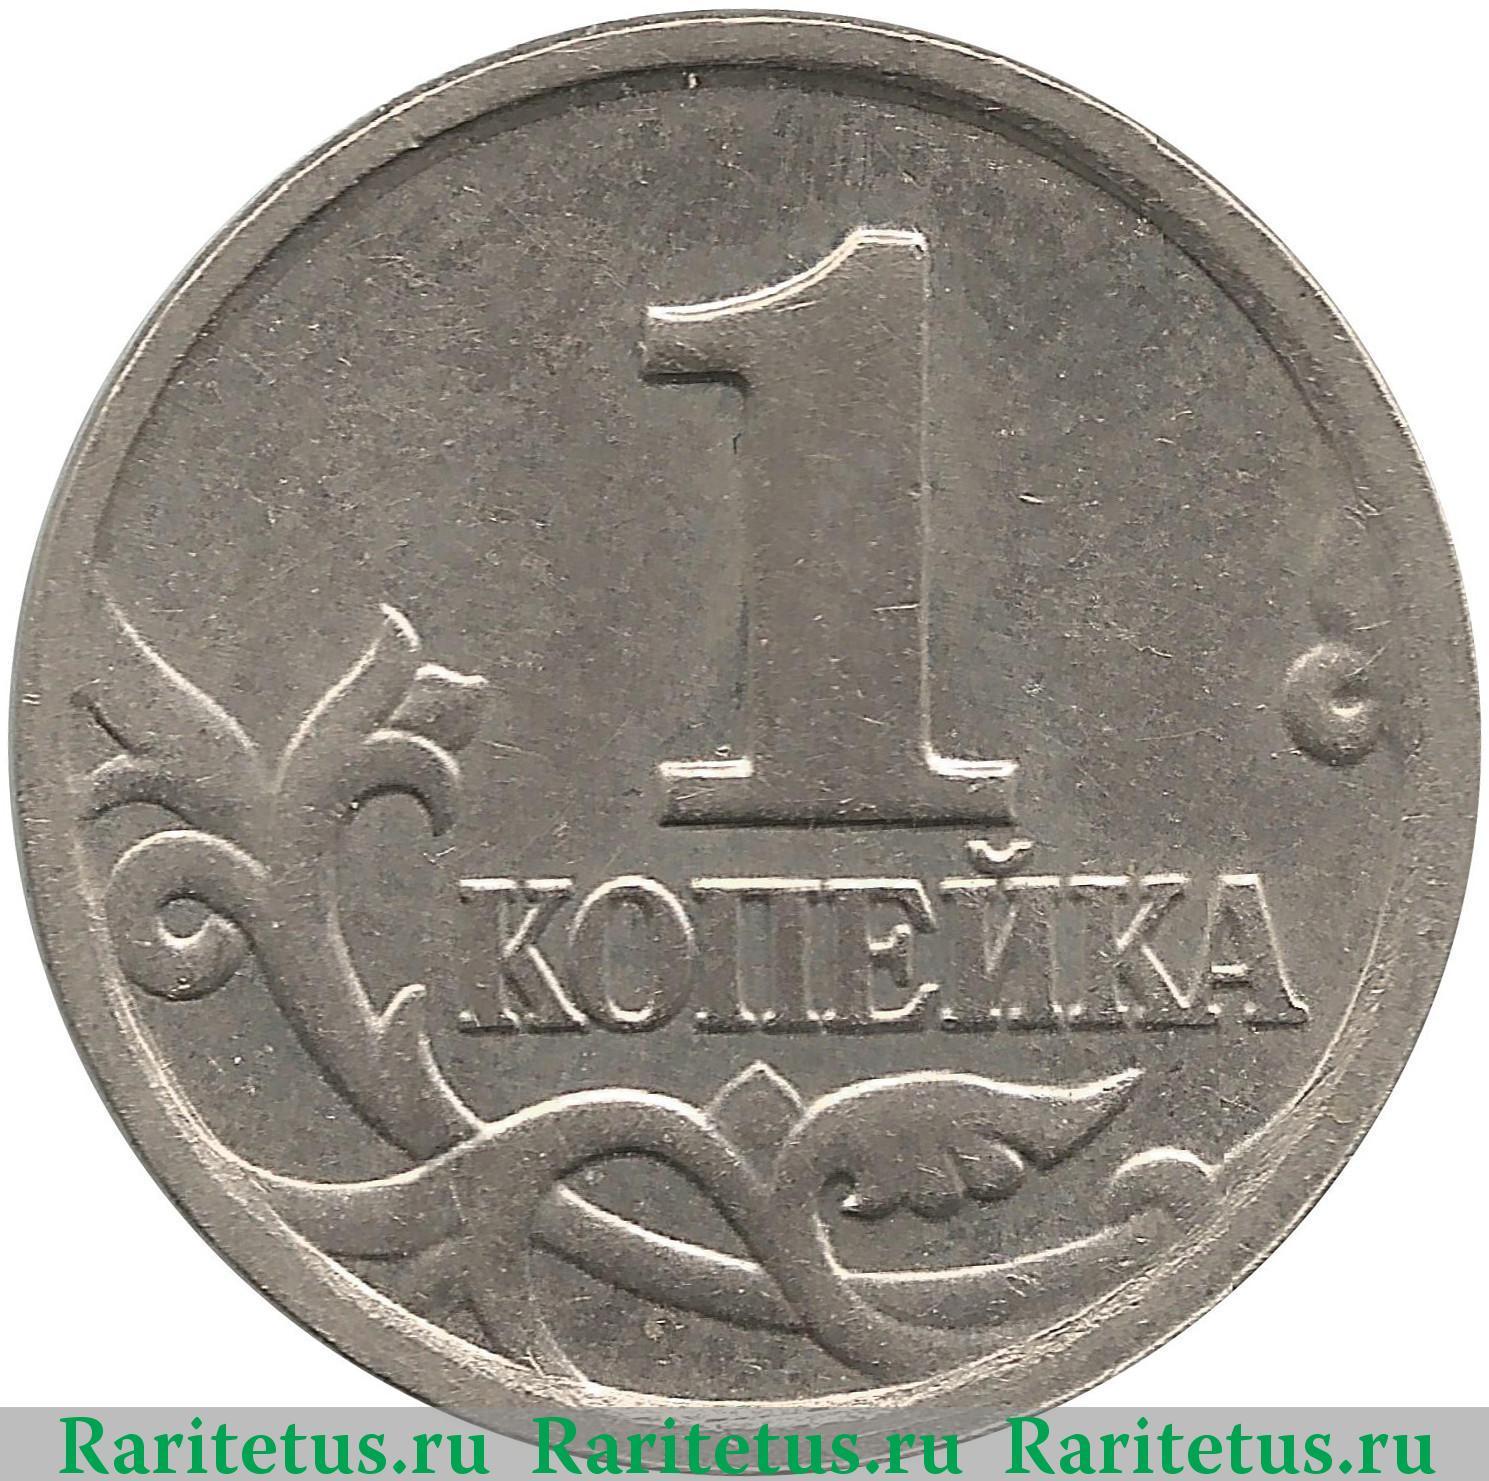 1коп 2004 монеты венесуэла